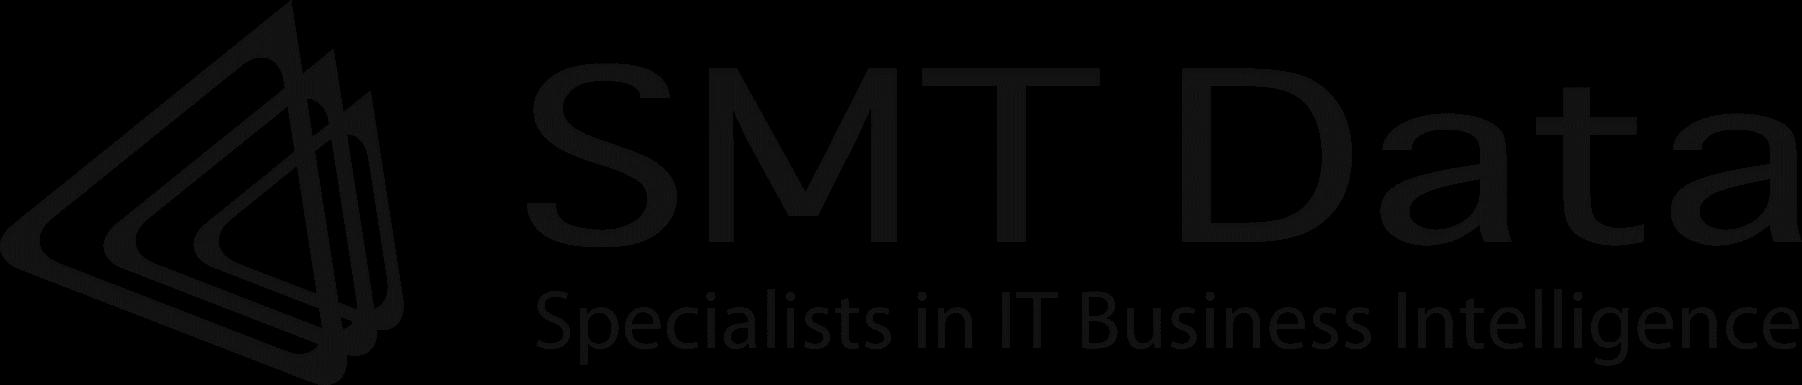 SMT Data_Specialists_Black